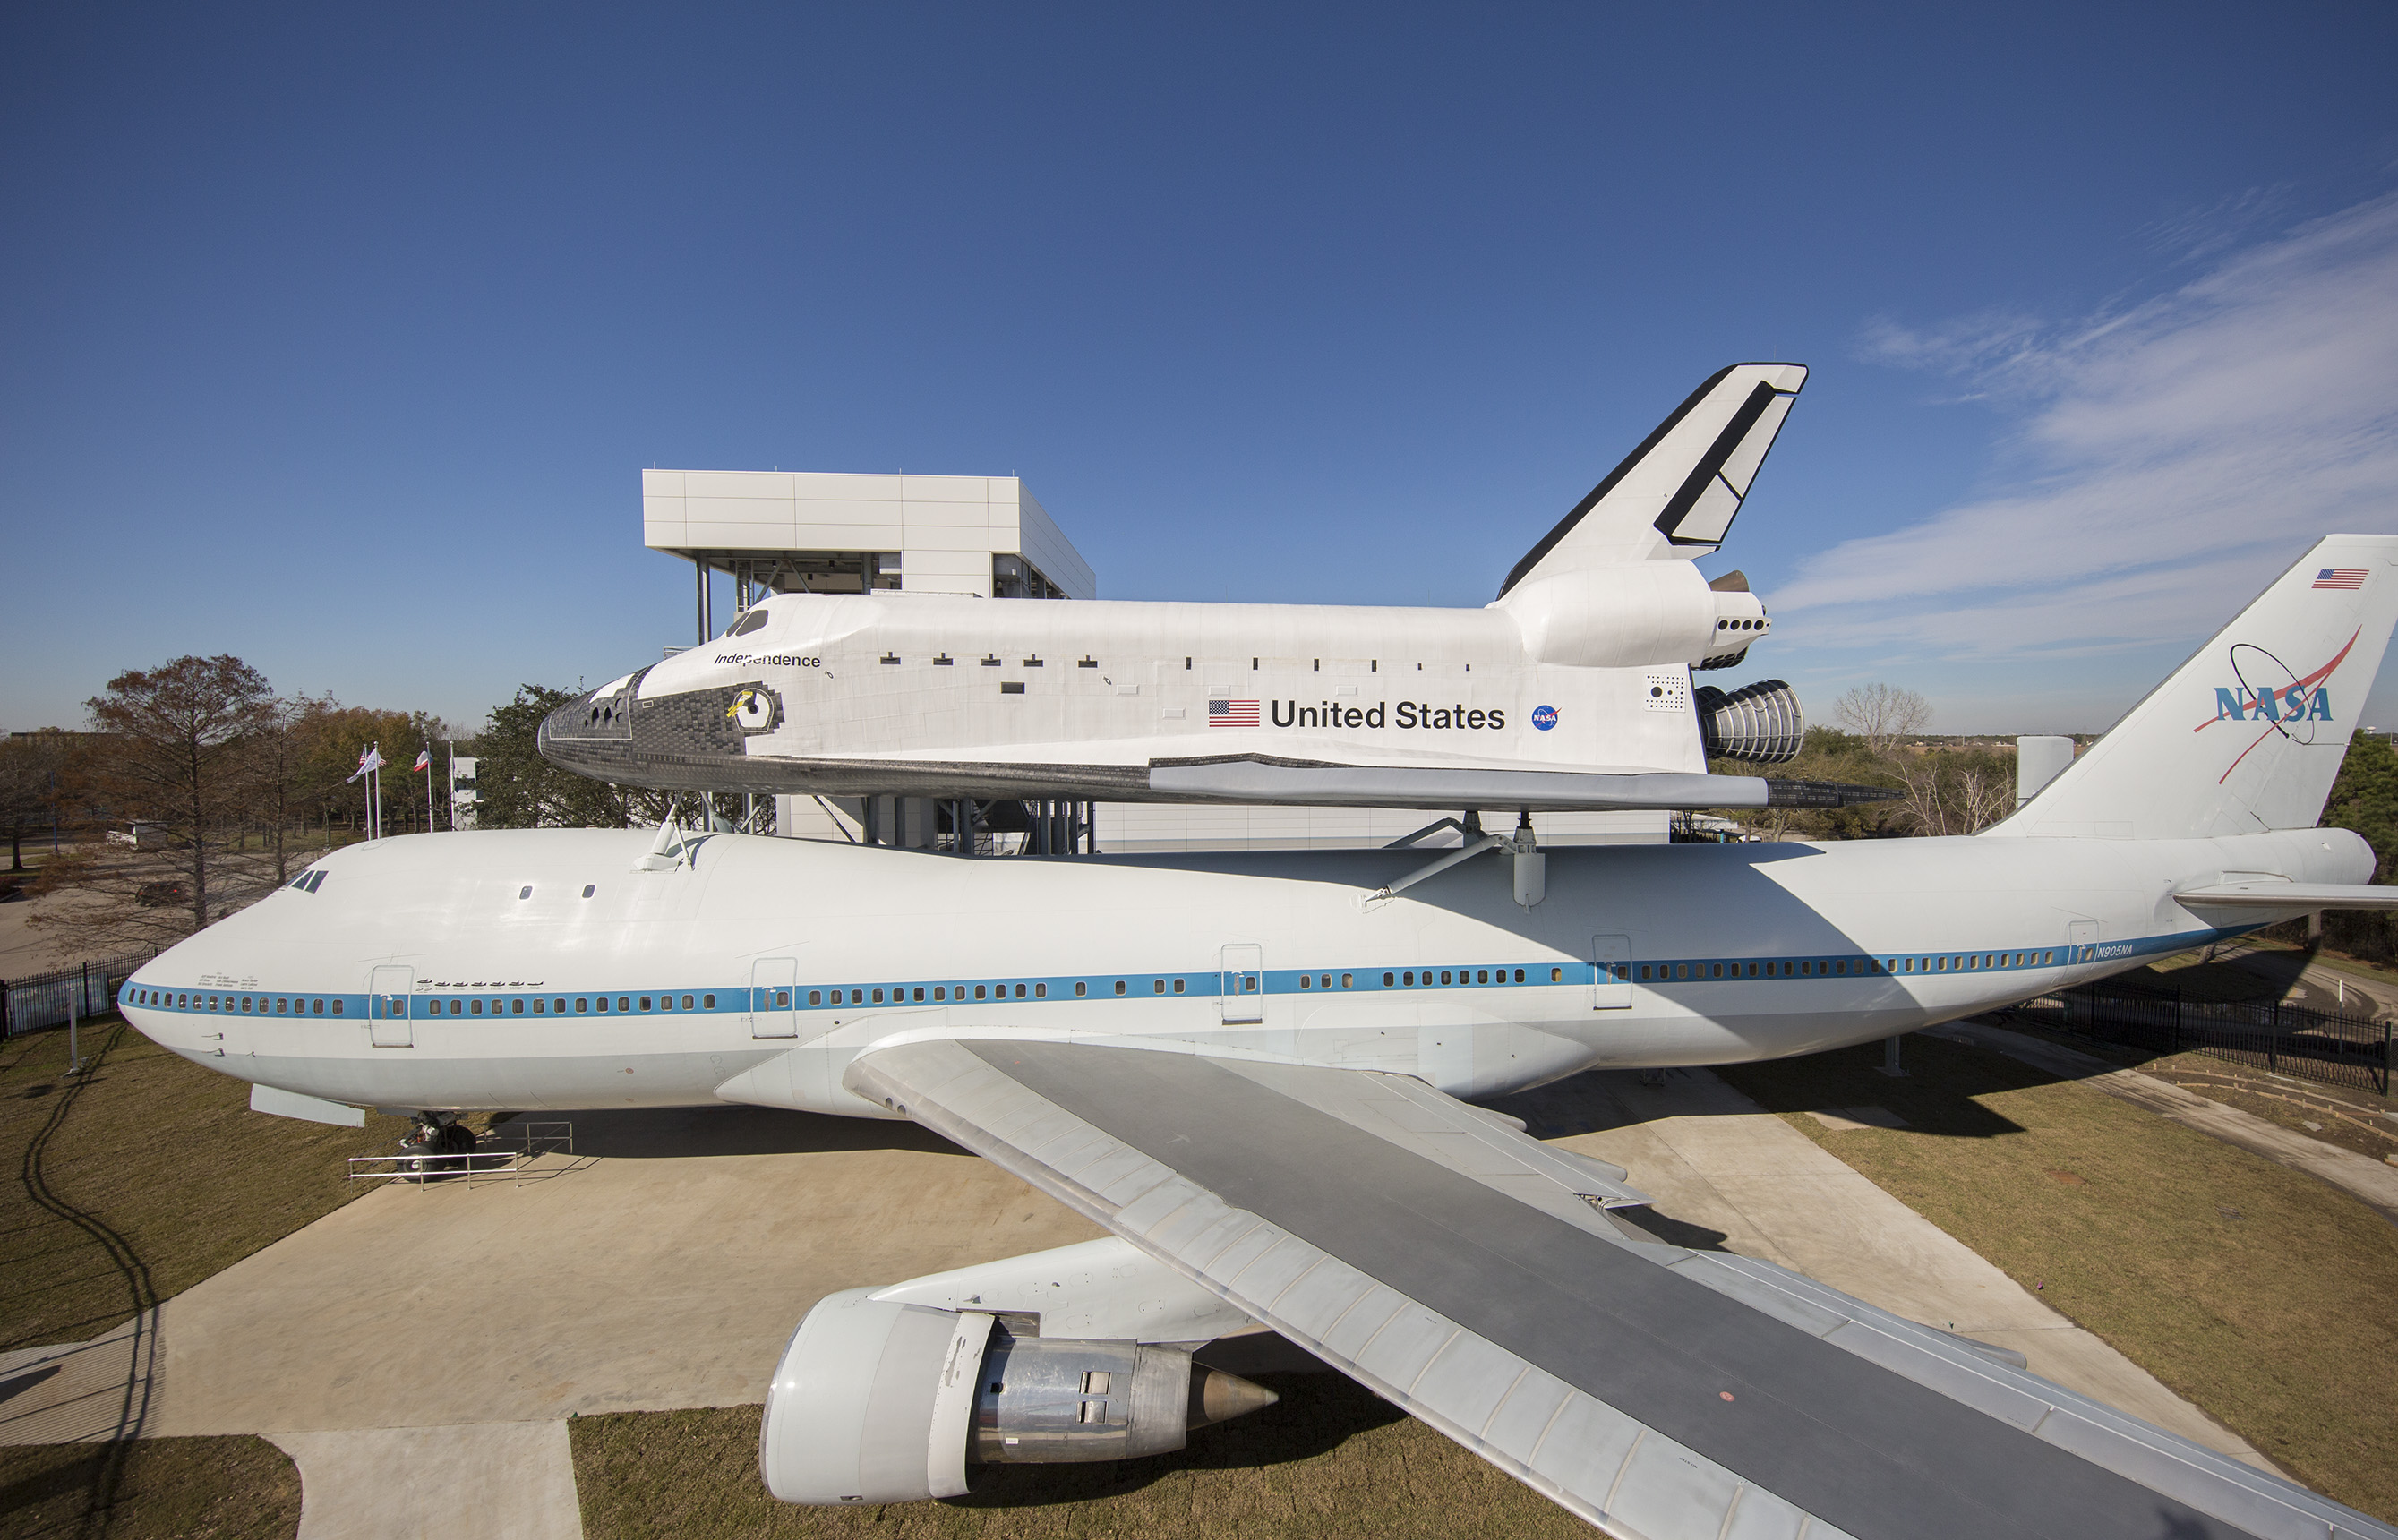 https://cdn.cnn.com/cnnnext/dam/assets/160122104019-02-shuttle-747-shuttle747-z3c-0198-med.jpg